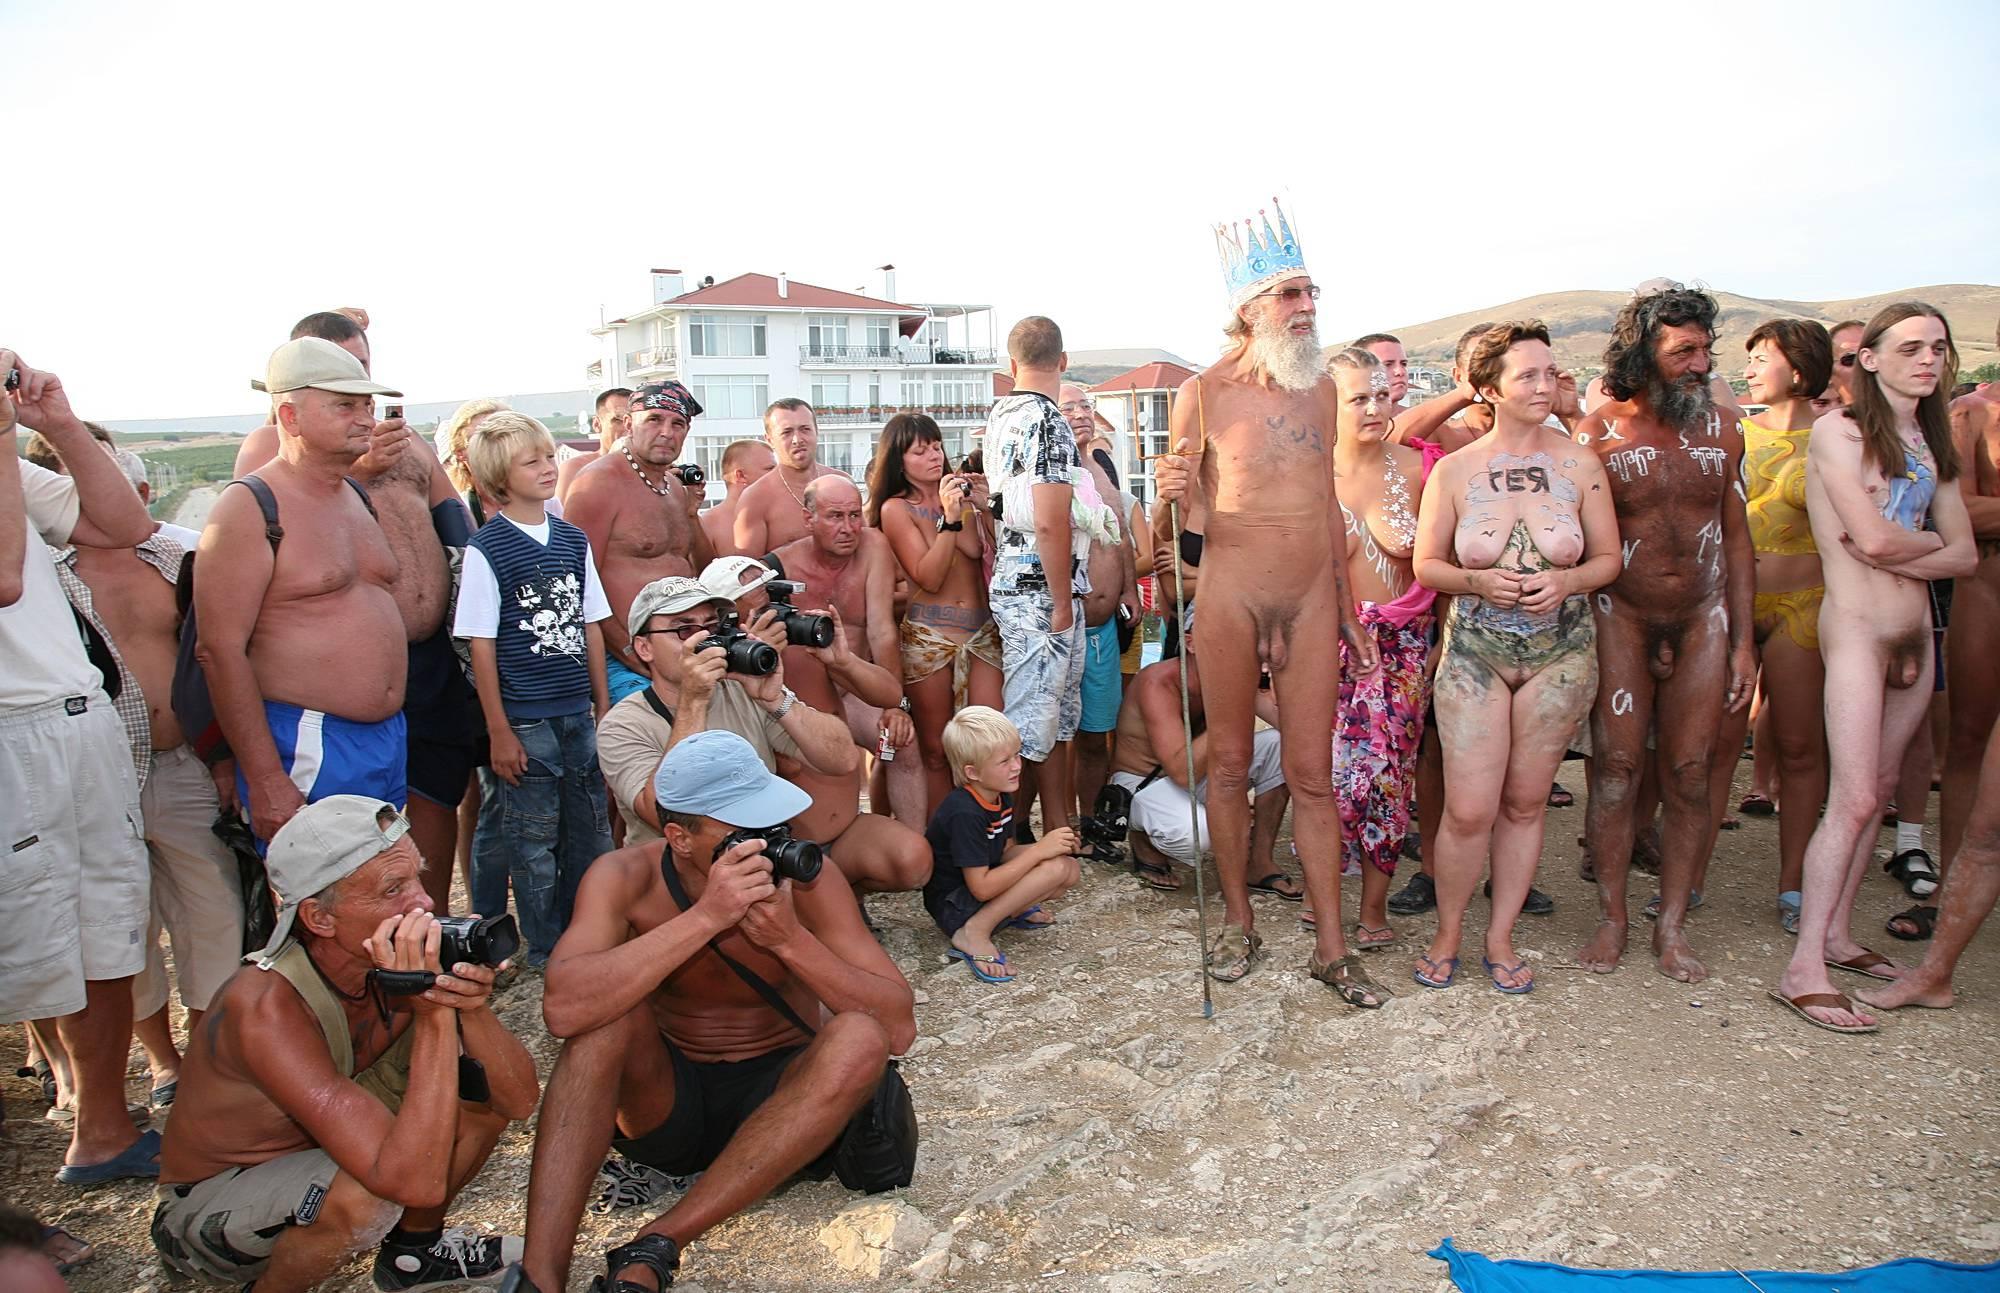 Pure Nudism-Bright Beach Swordplay - 3